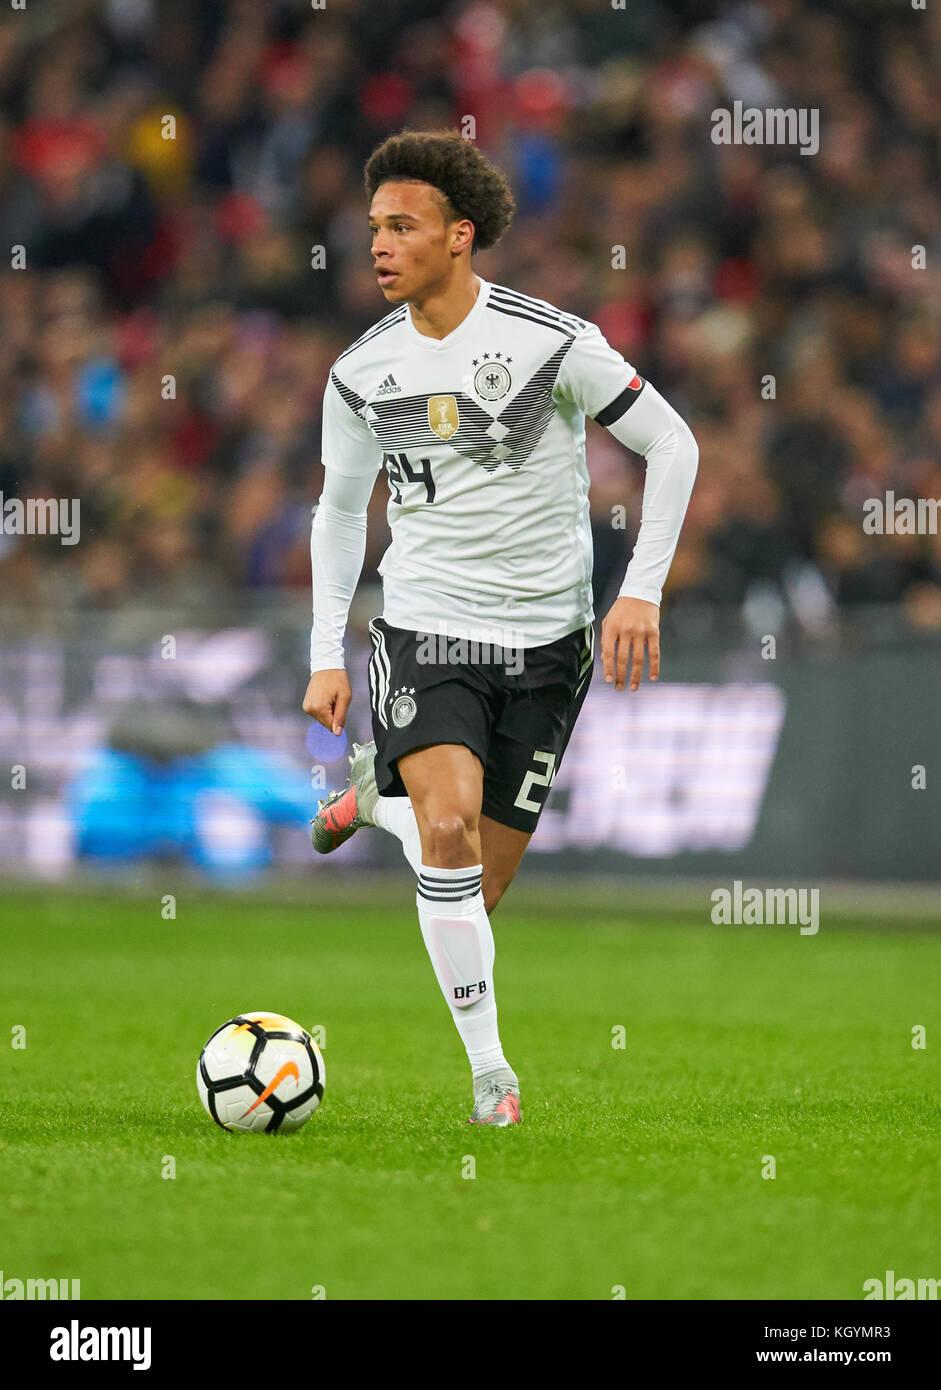 Soccer friendly match, London, November 10, 2017 Leroy SANE, DFB 24    drives the ball, action, full-size,  ENGLAND Stock Photo